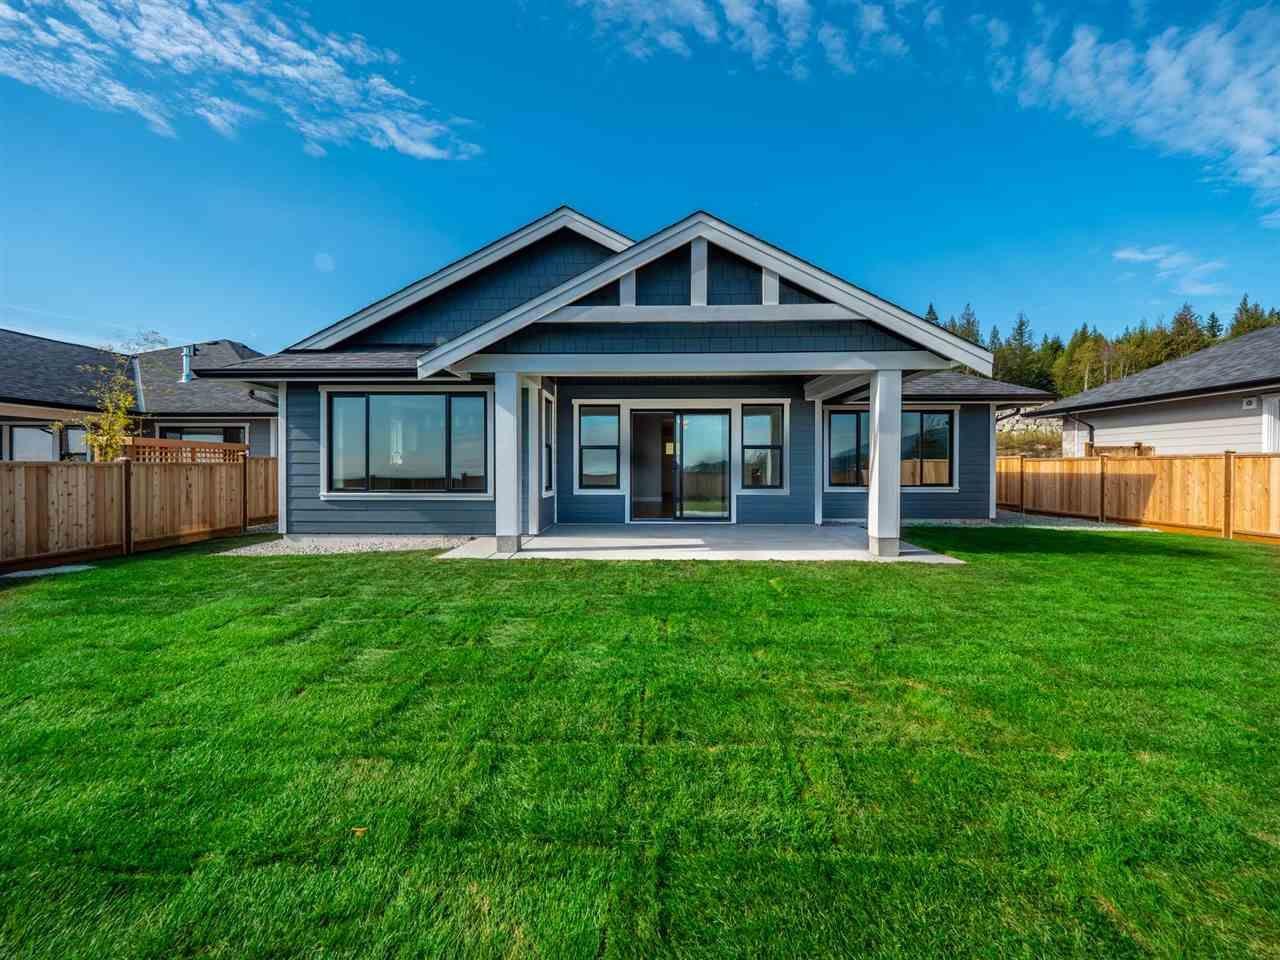 Main Photo: 5620 DERBY Road in Sechelt: Sechelt District House for sale (Sunshine Coast)  : MLS®# R2553195